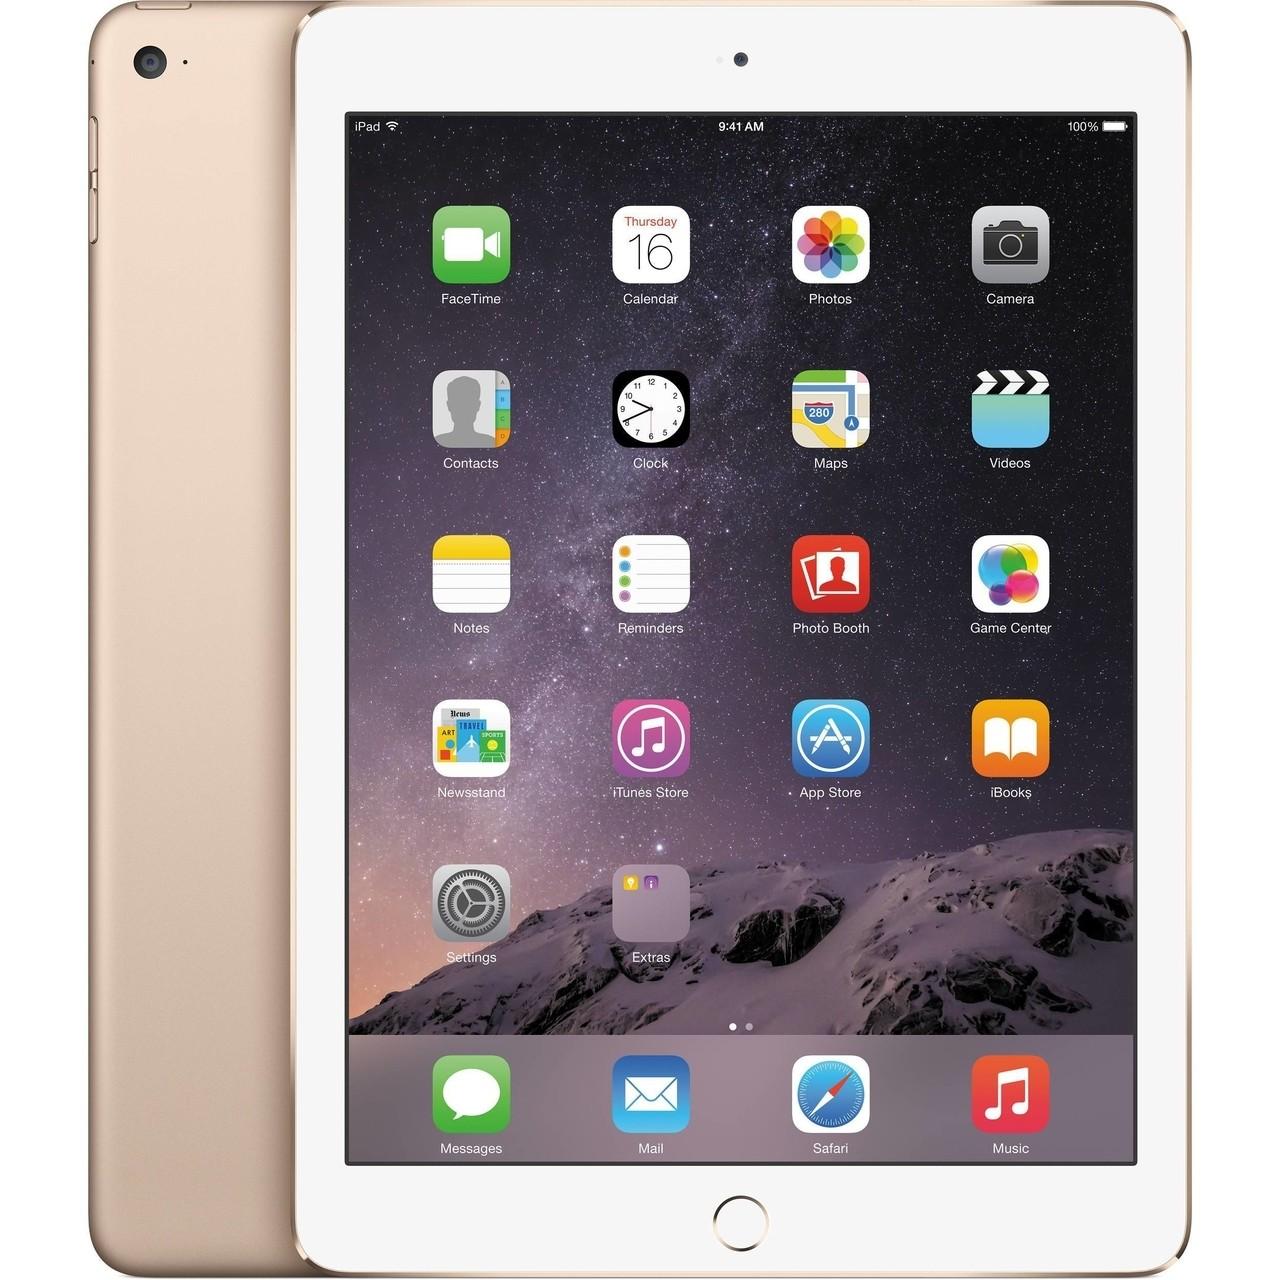 Apple iPad Air 2 - 64GB - Gold - (Retina Display) - A Grade Tweedehands